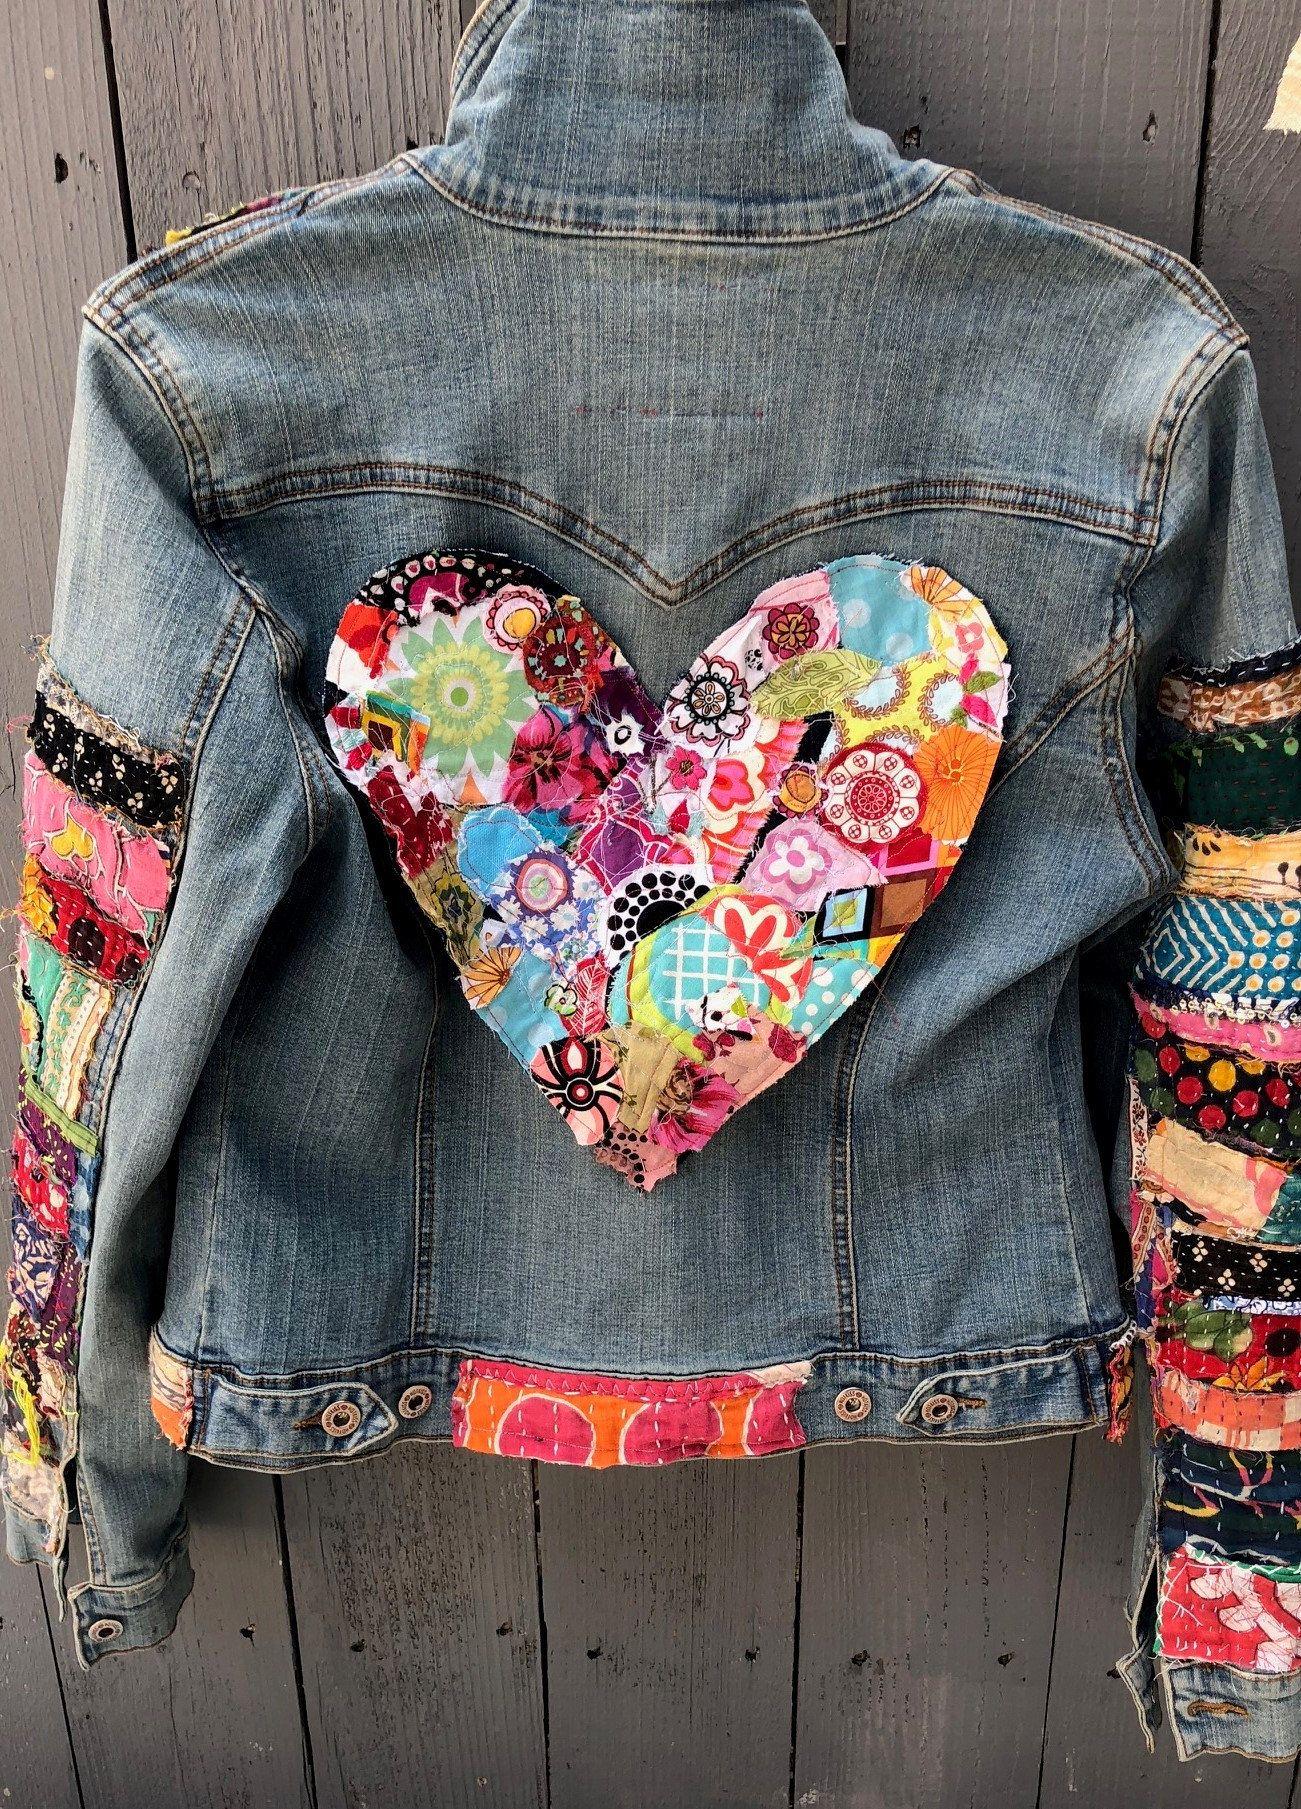 Jean Jacket Hippie Boho Embellished Colorful Denim Jean Jacket Denim Jean Jacket Colored Denim Hippie Boho [ 1809 x 1301 Pixel ]